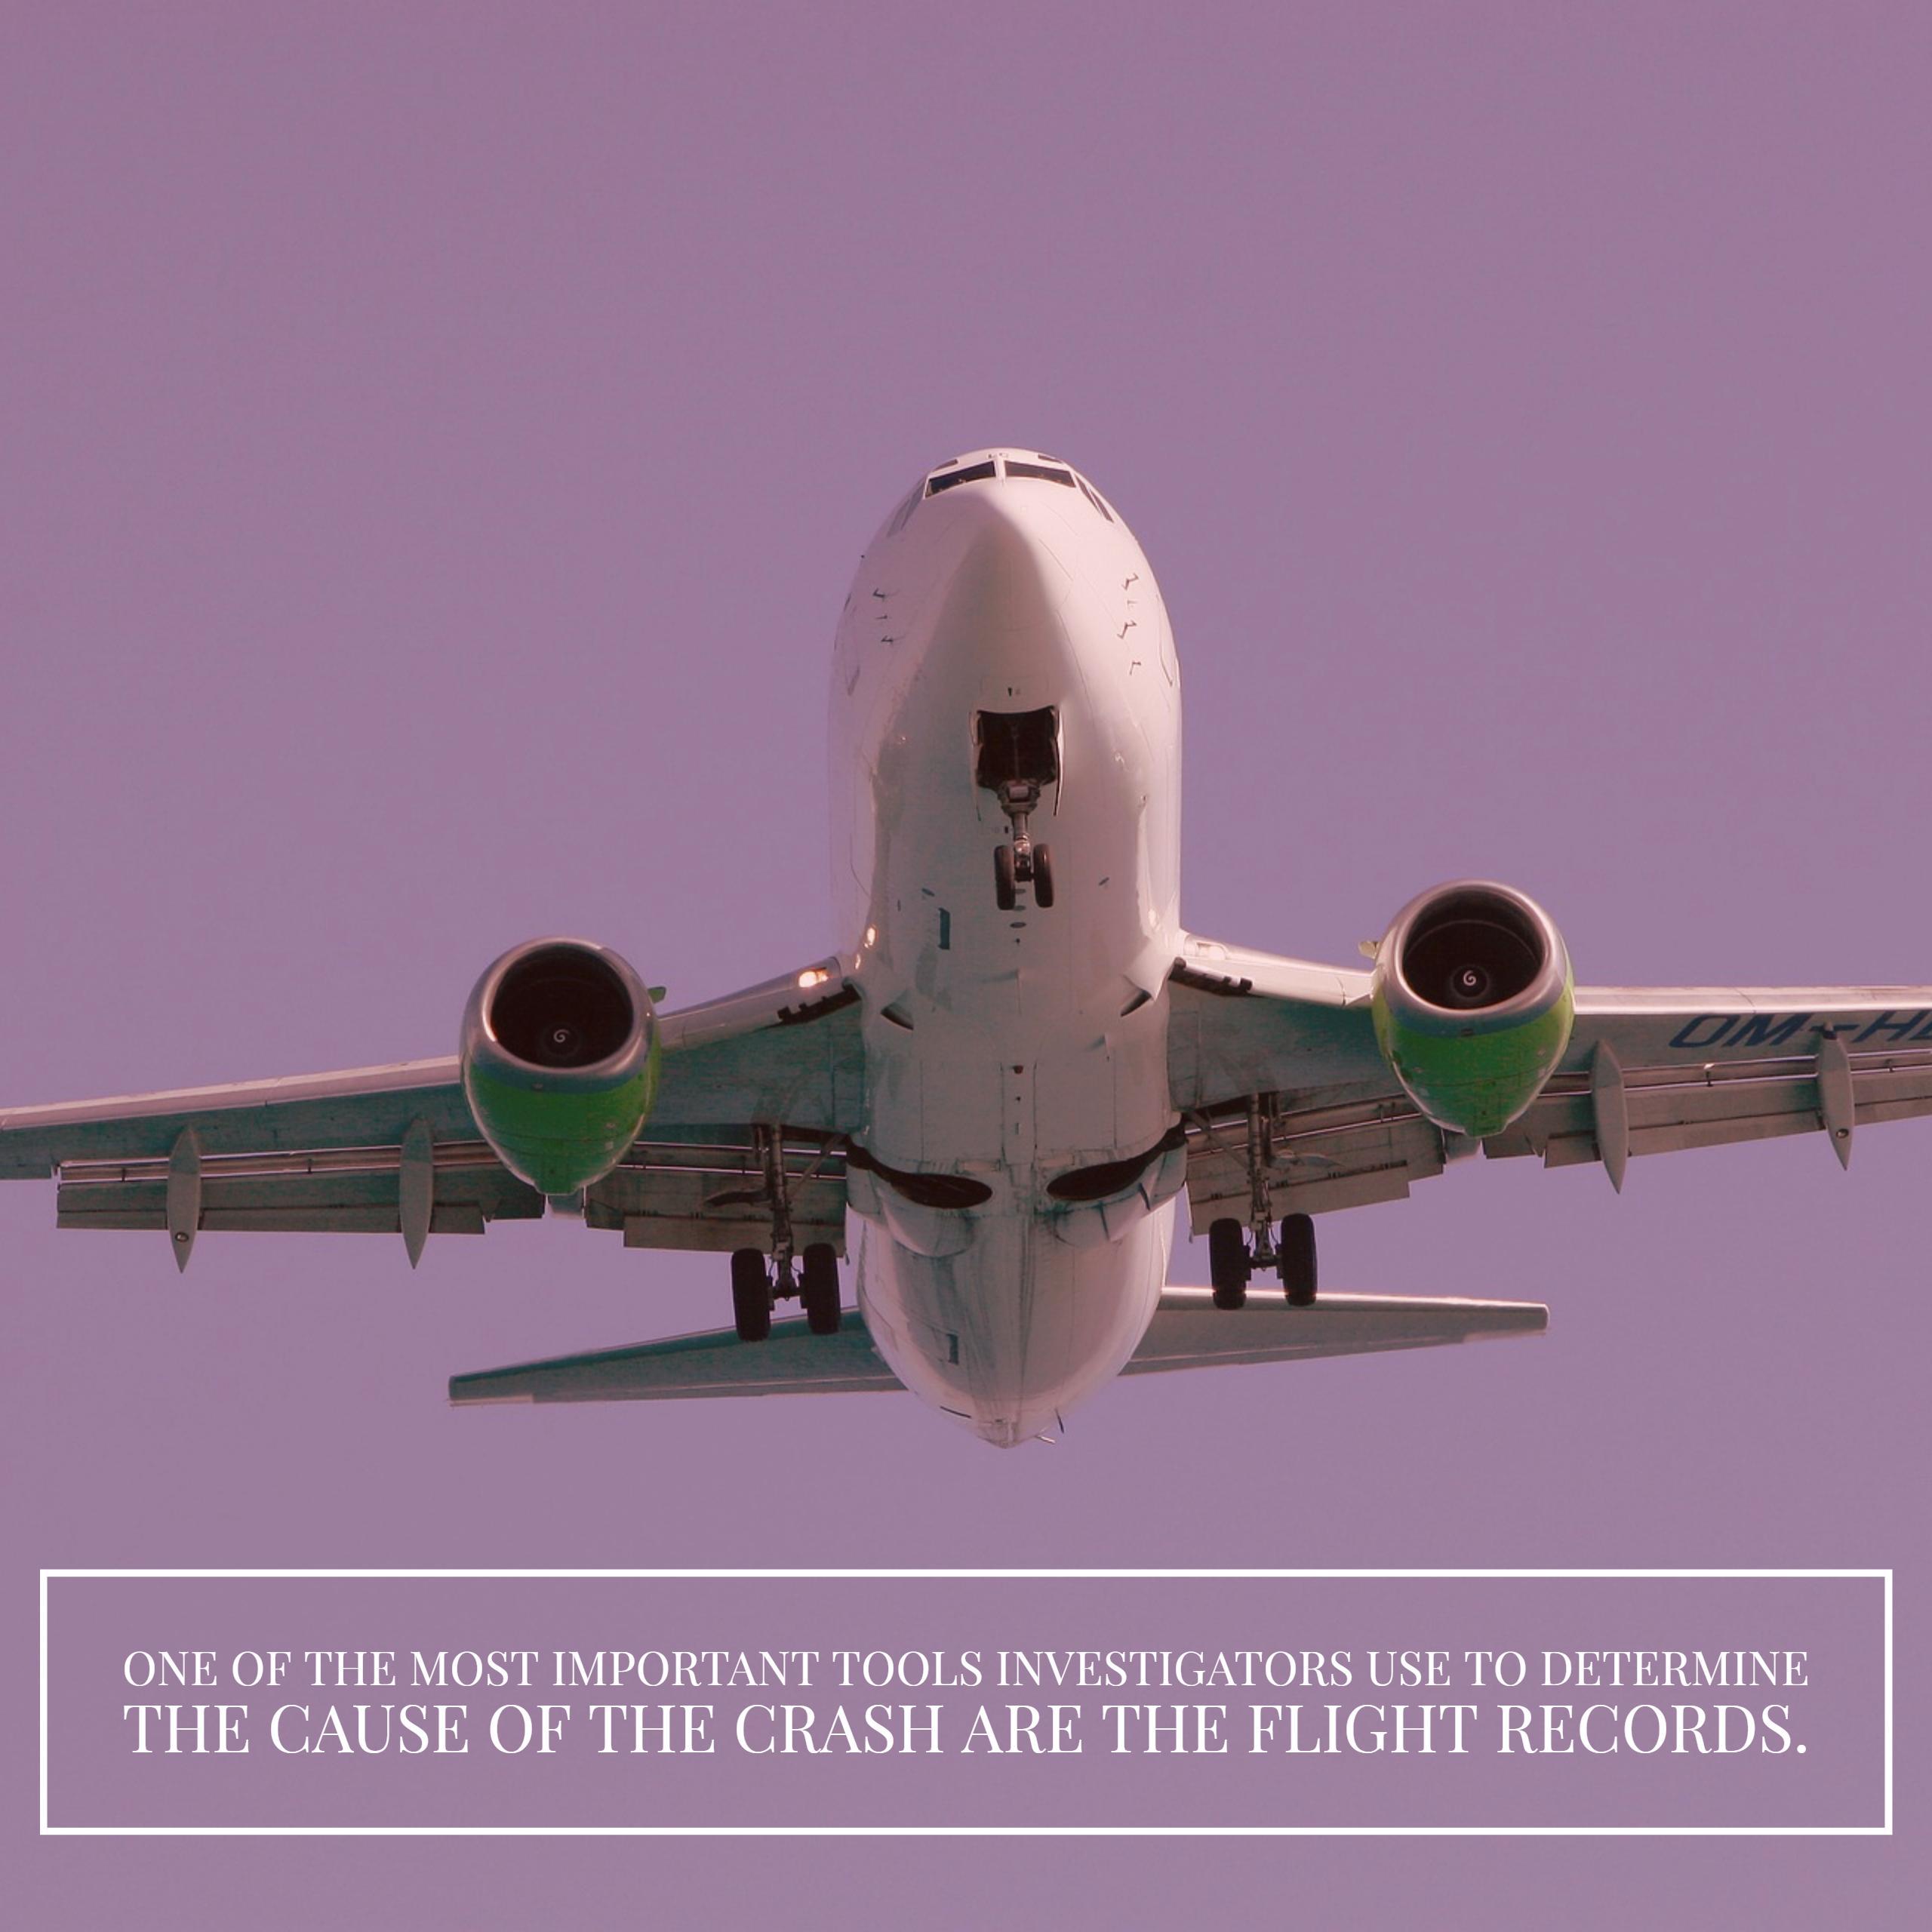 plane-crash-lawyer-discusses-flight-records-after-crash